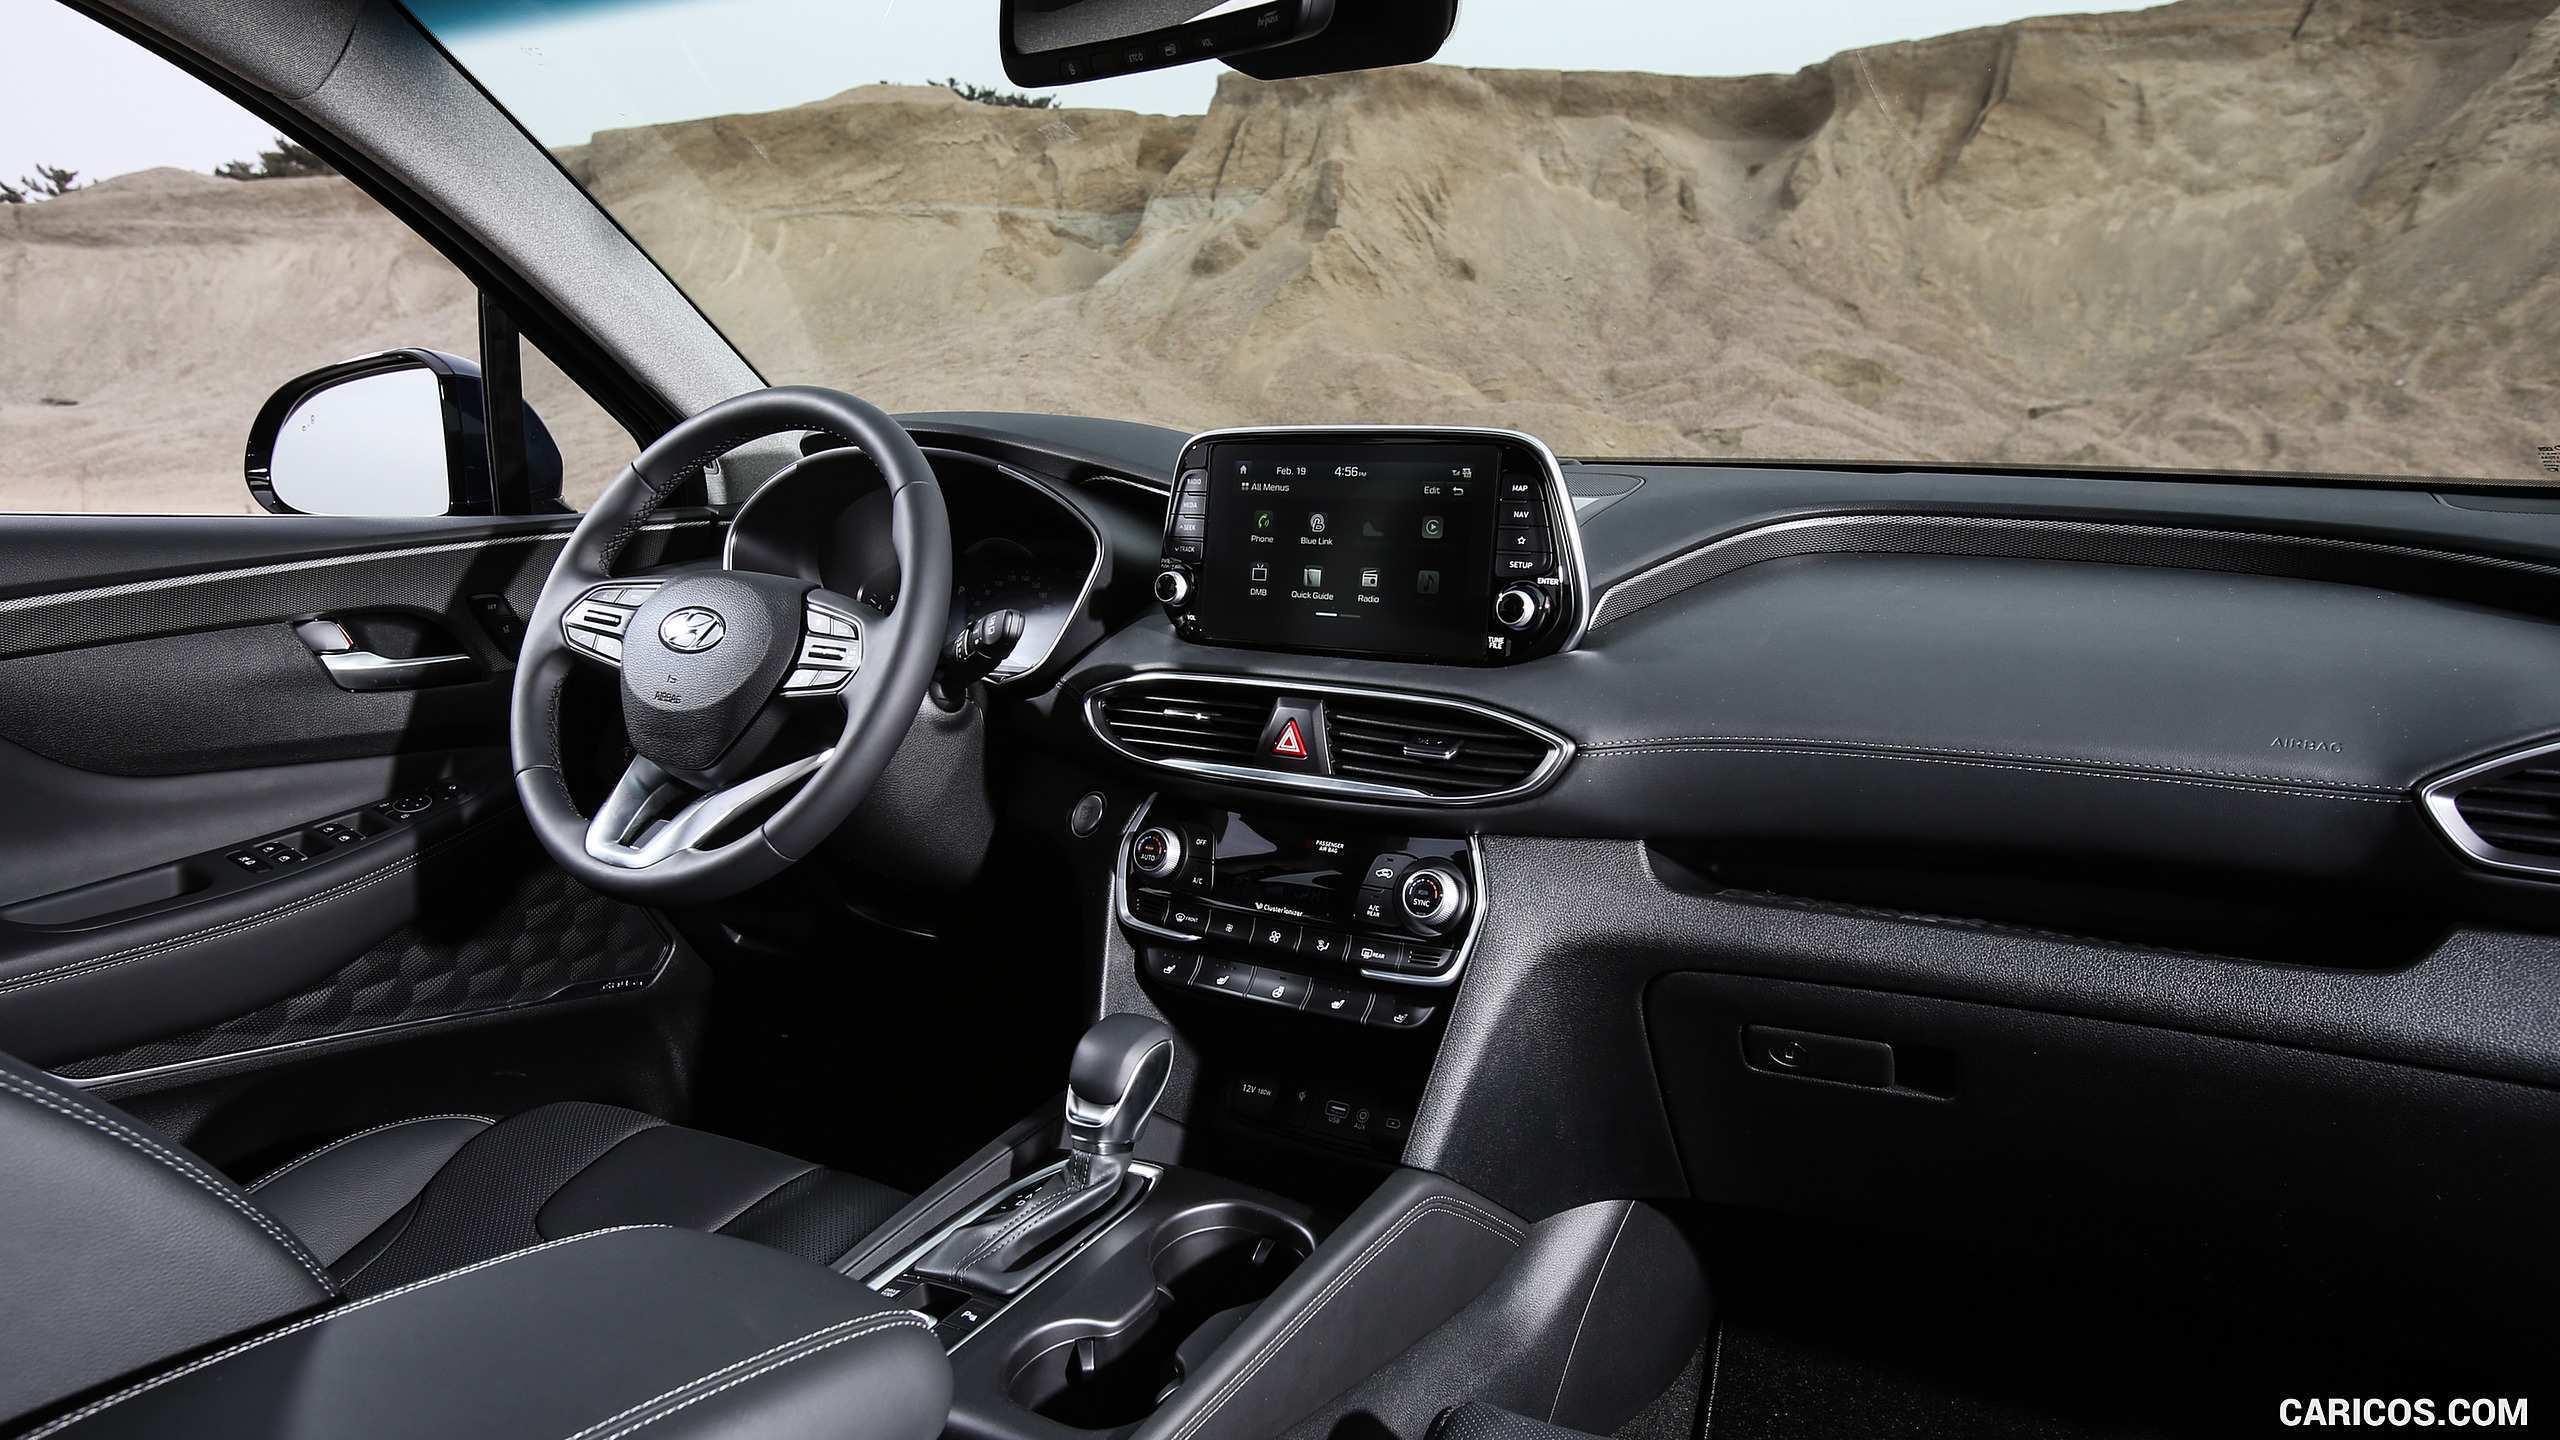 66 Concept of 2019 Hyundai Santa Fe Interior Model by 2019 Hyundai Santa Fe Interior